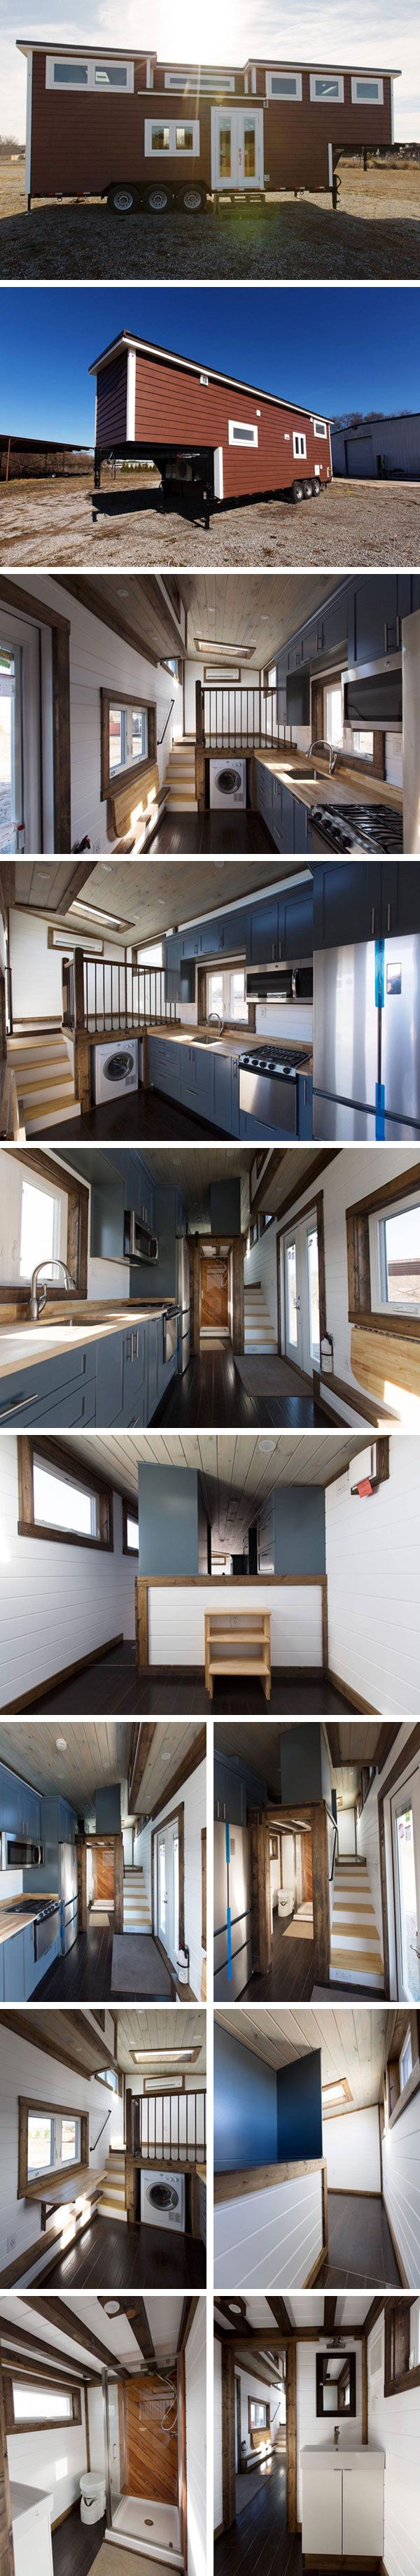 Дом на колесах Lookout от Tiny House Chattanooga #tinyhomesdigest #tinyhouse #houseonwheels #camper